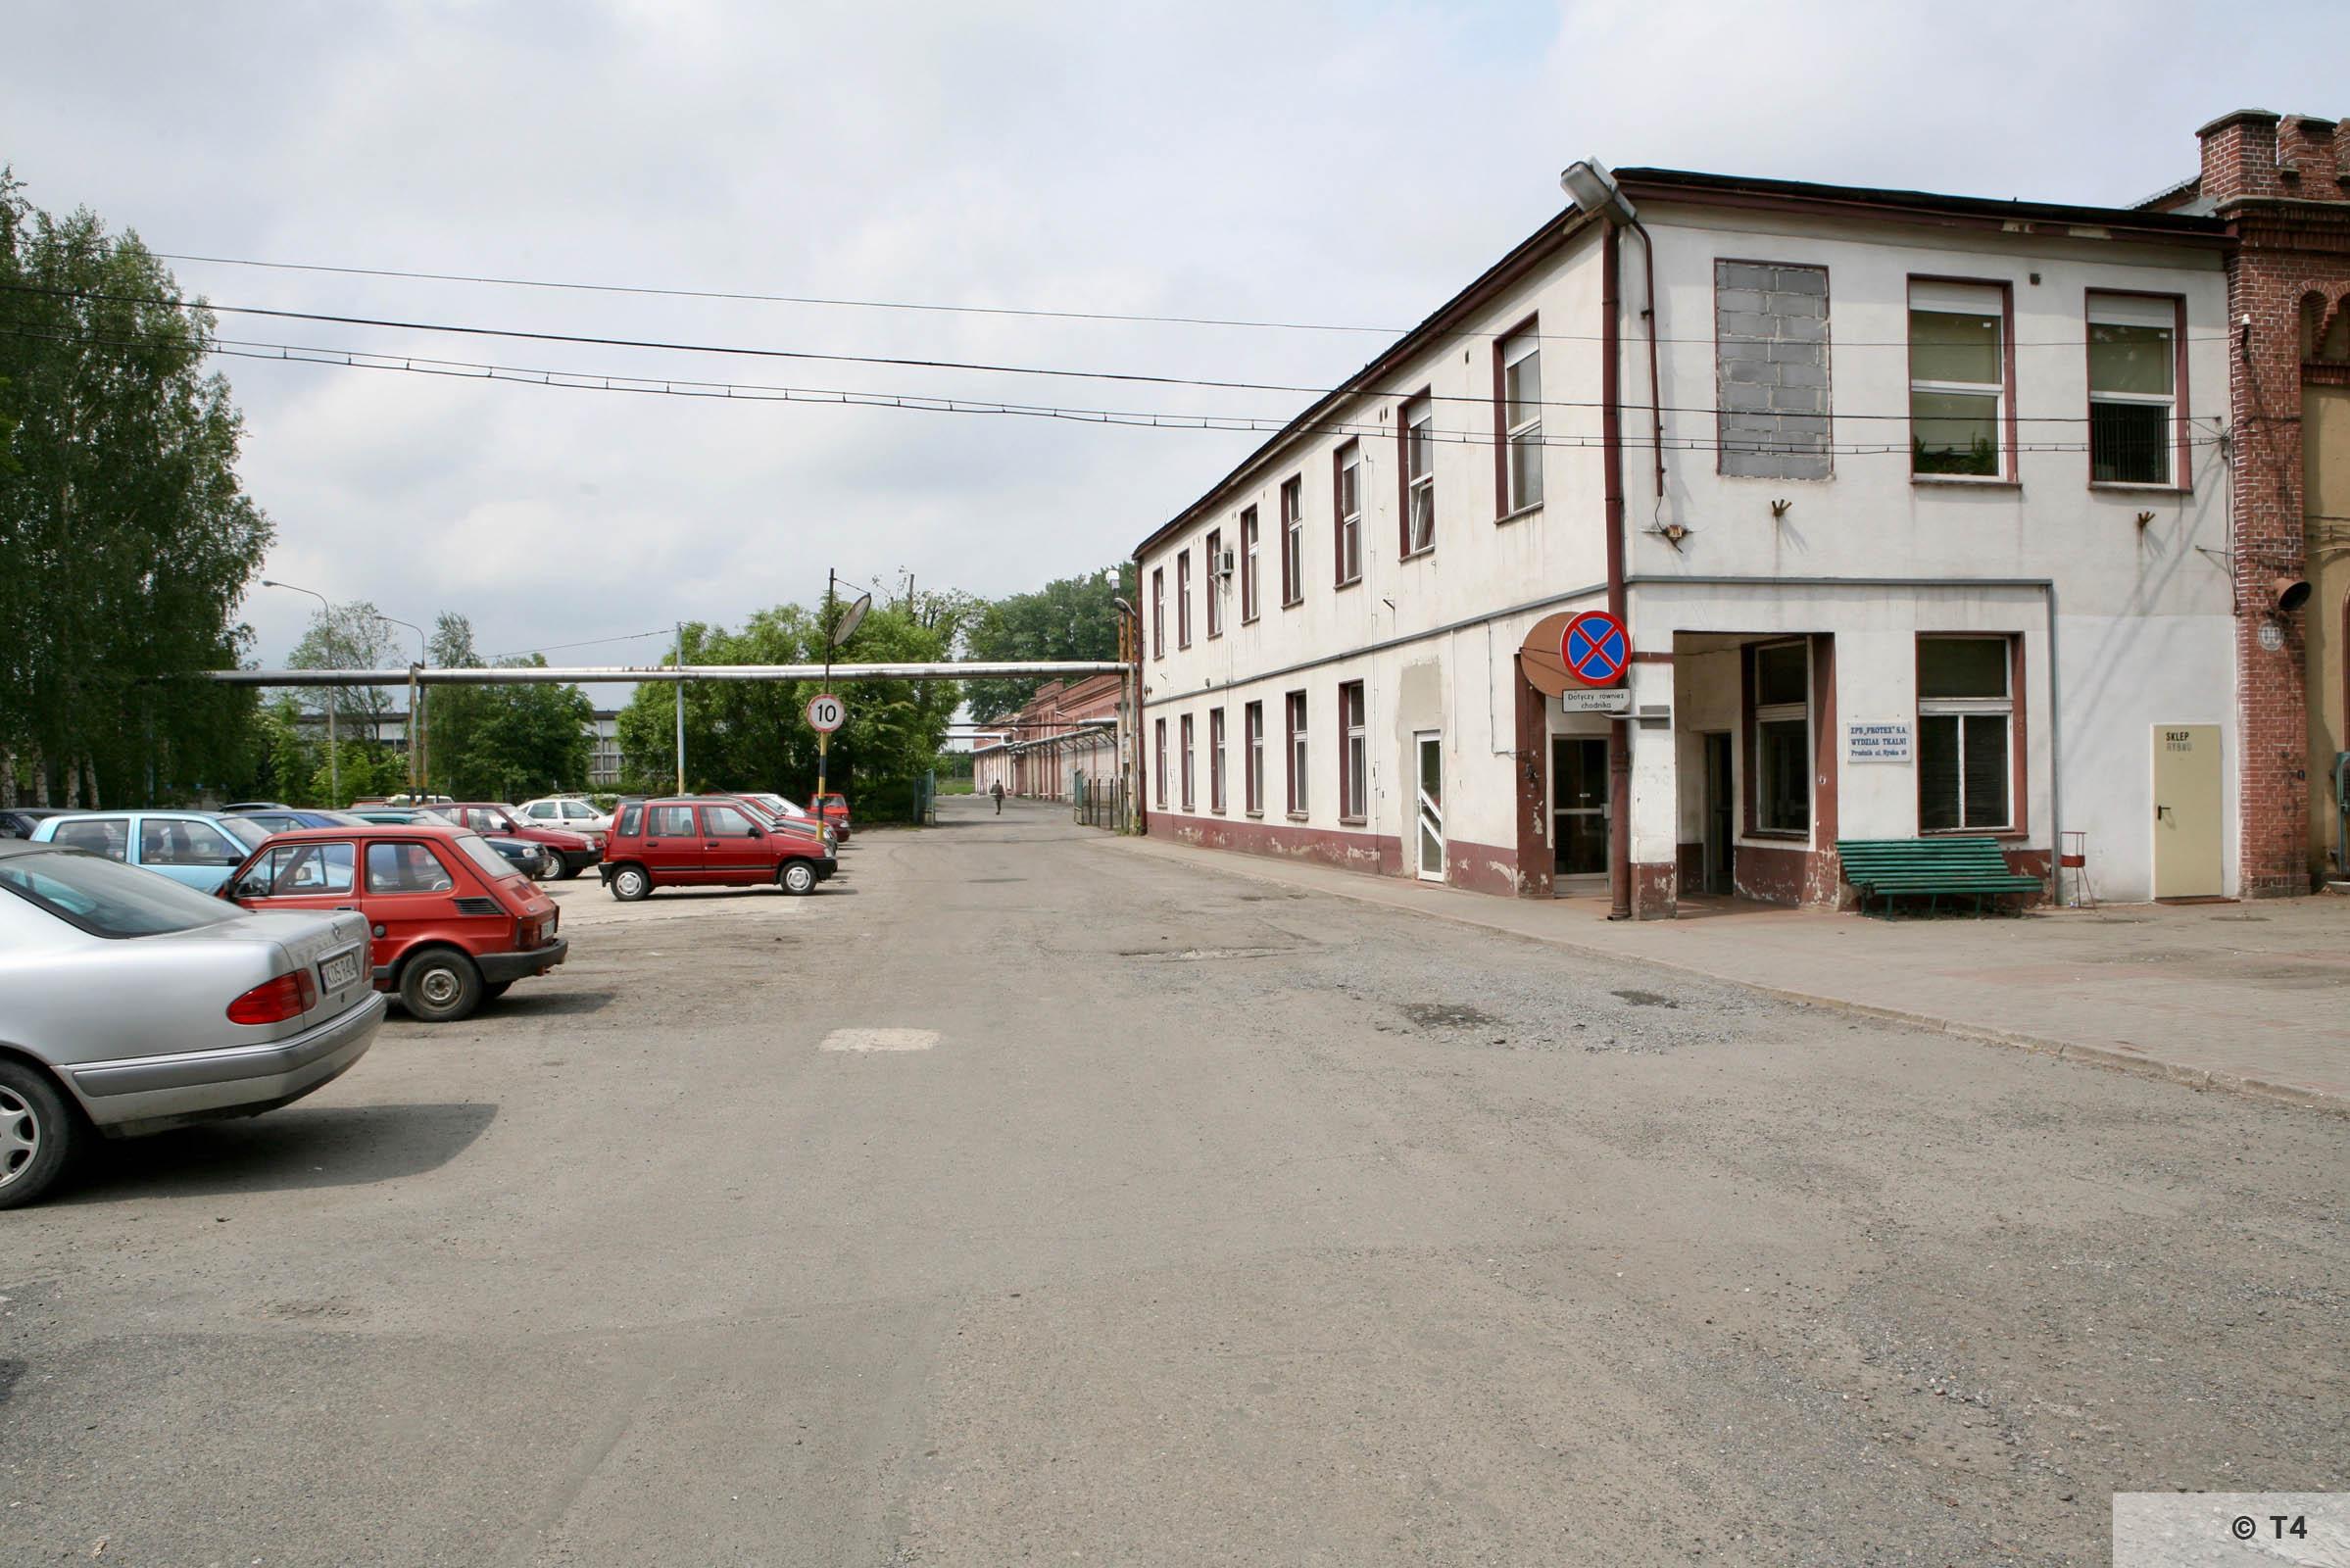 Main entrance to former Schlesische Feinweberei AG textile mill. 2006 T4 5215